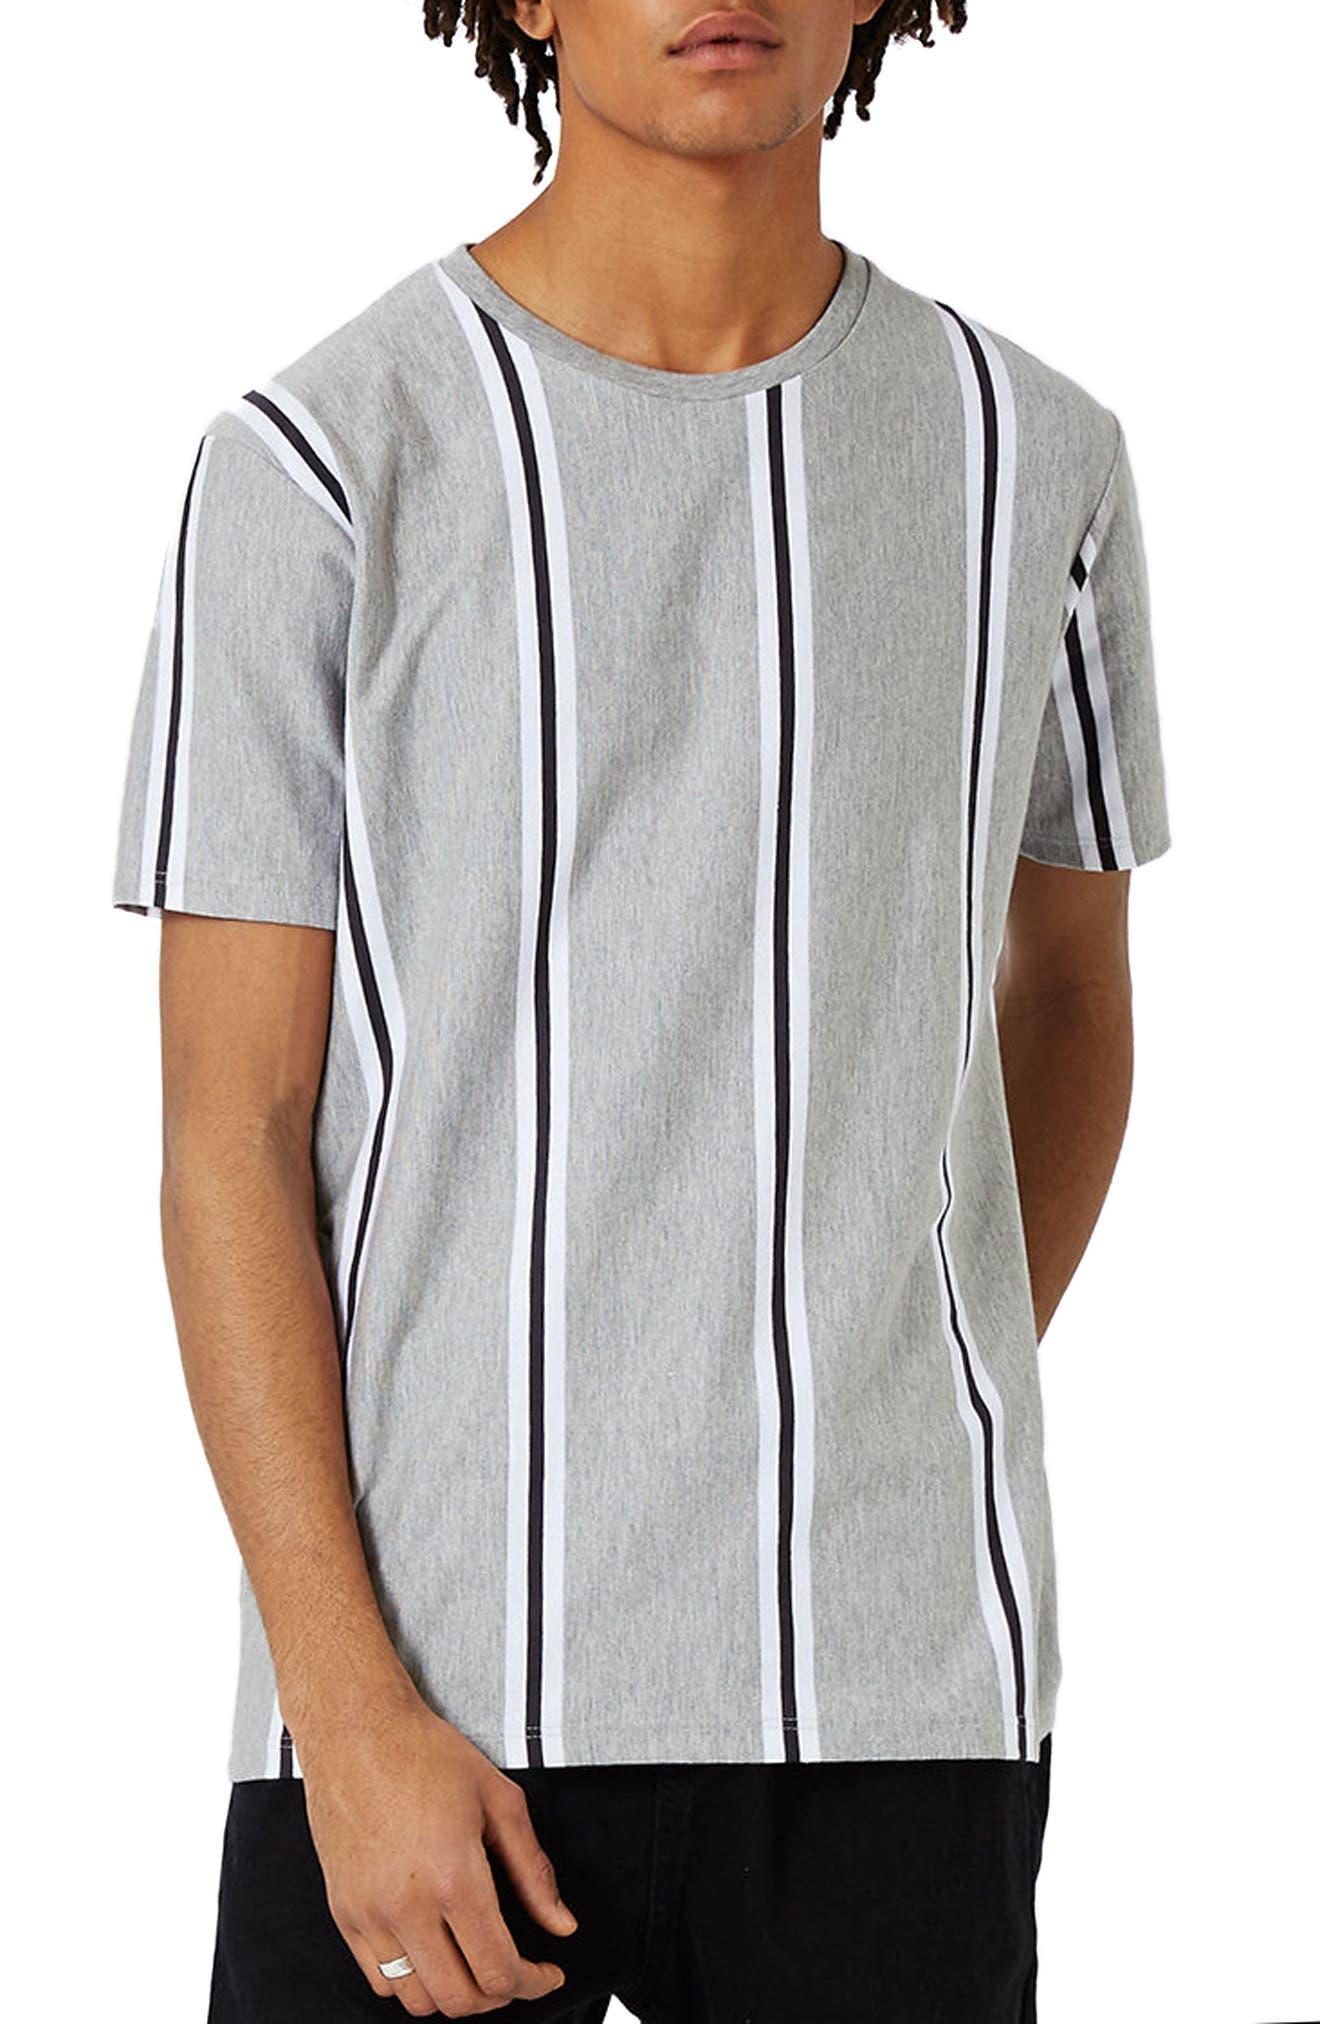 TOPMAN Vertical Stripe T-Shirt